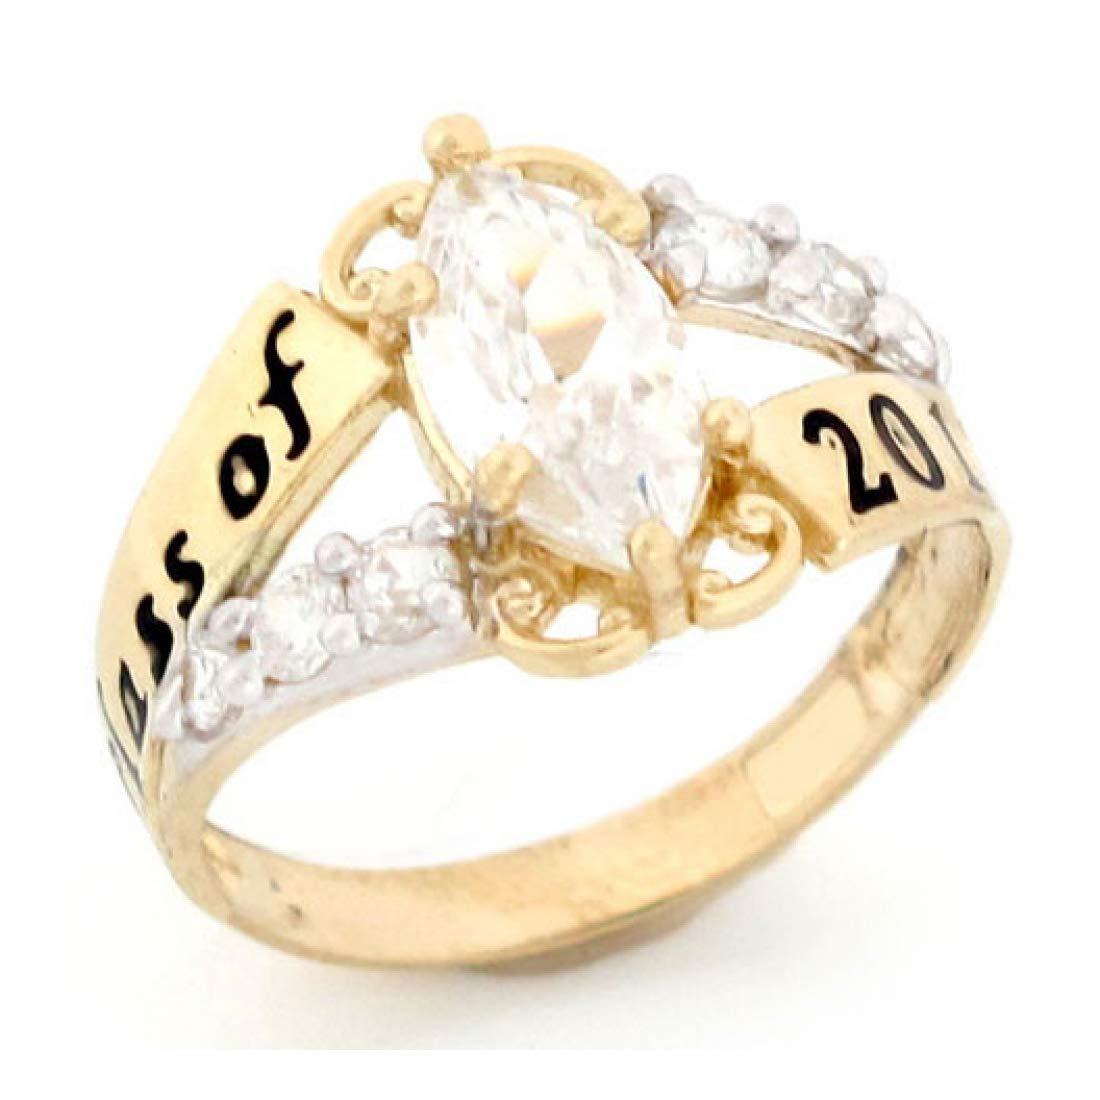 10k Gold Simulated April Birthstone 2019 Class Graduation Ring